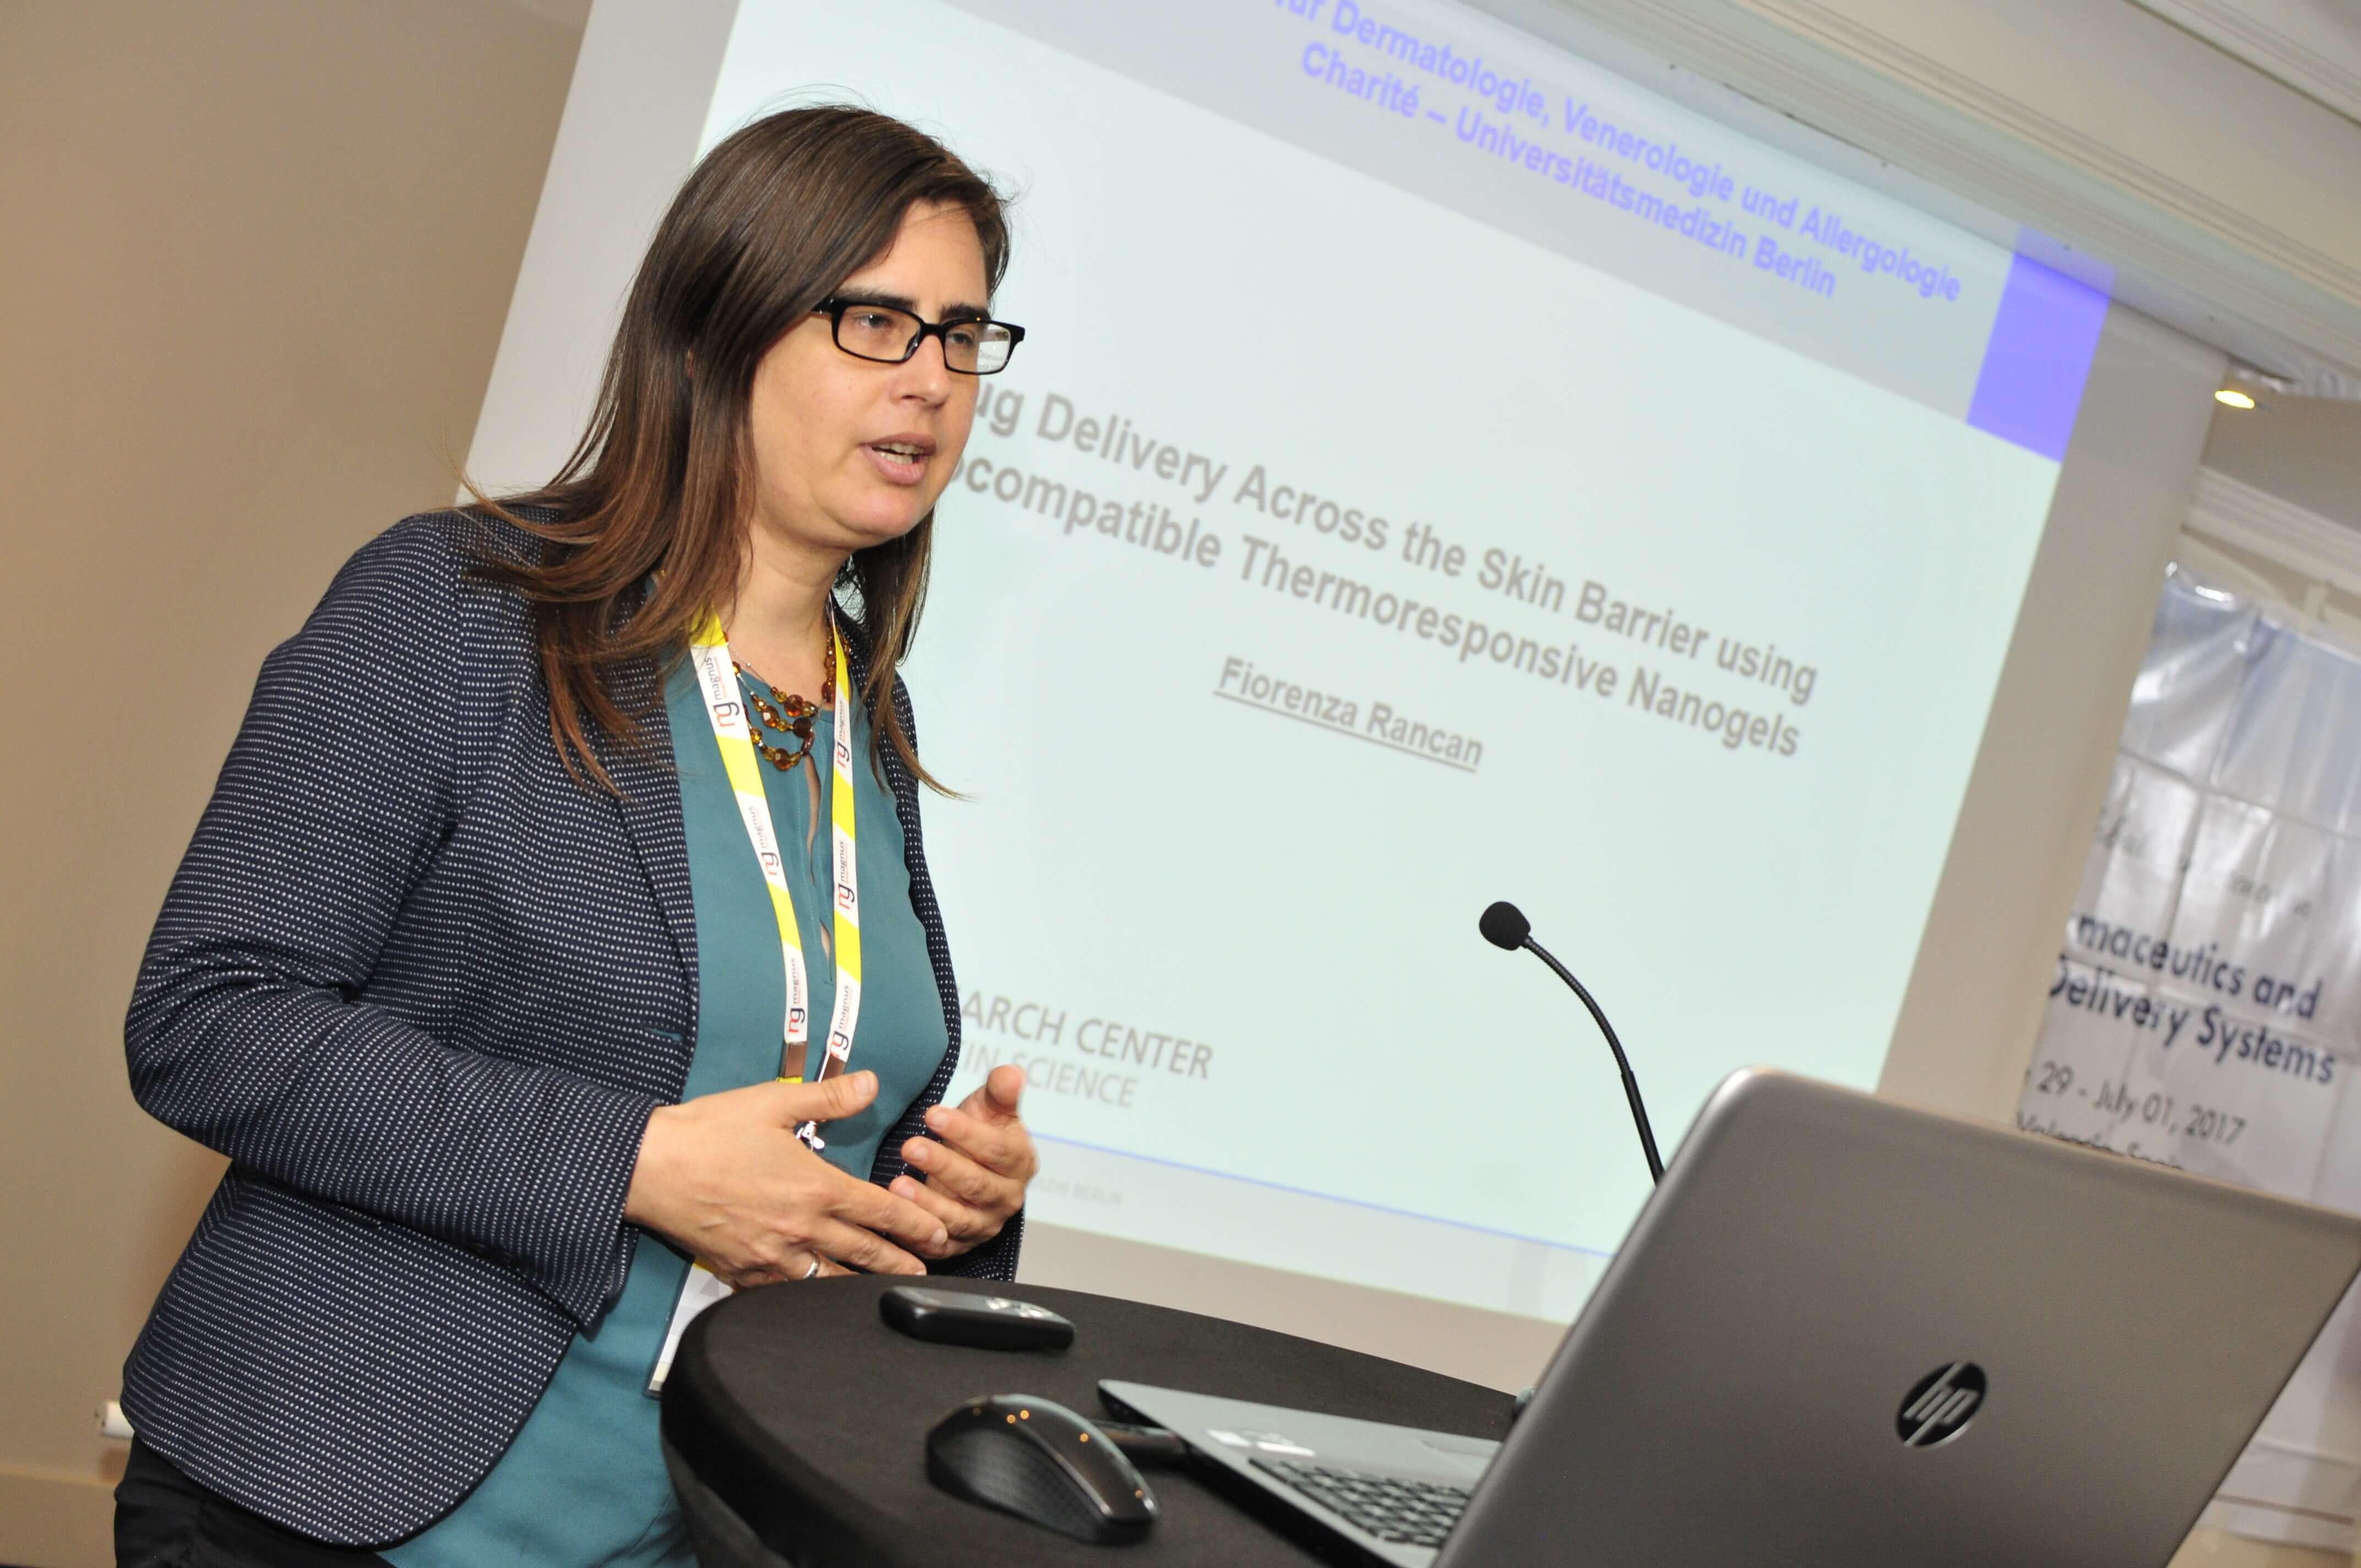 Speaker for Pharma Conferences 2020-Fiorenza Rancan Charite